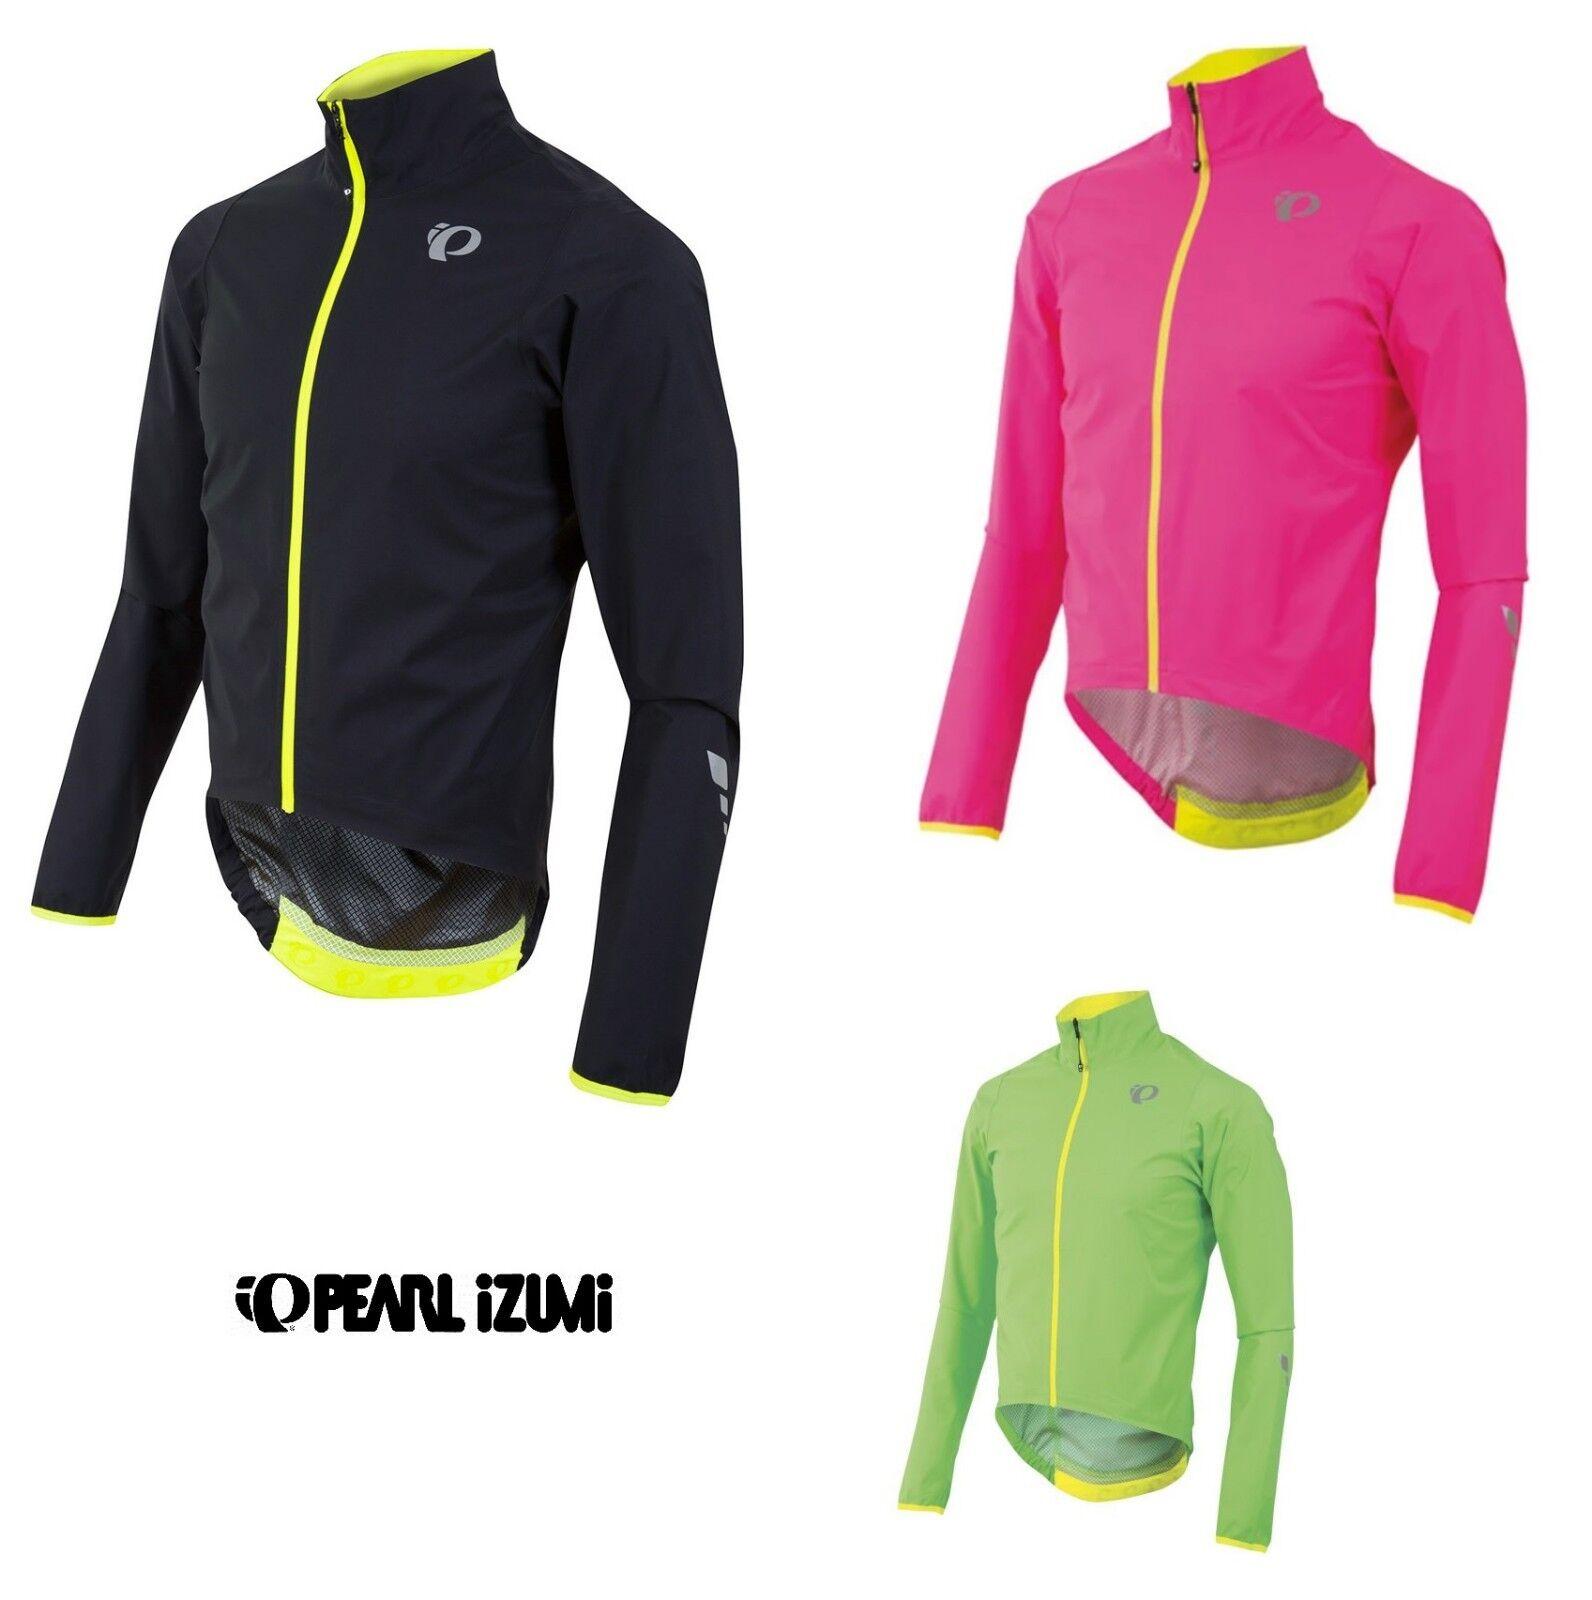 Pearl Izumi   pro Aero wxb Jacket  lluvia chaqueta PVP 179,95   nuevo  177  calidad garantizada